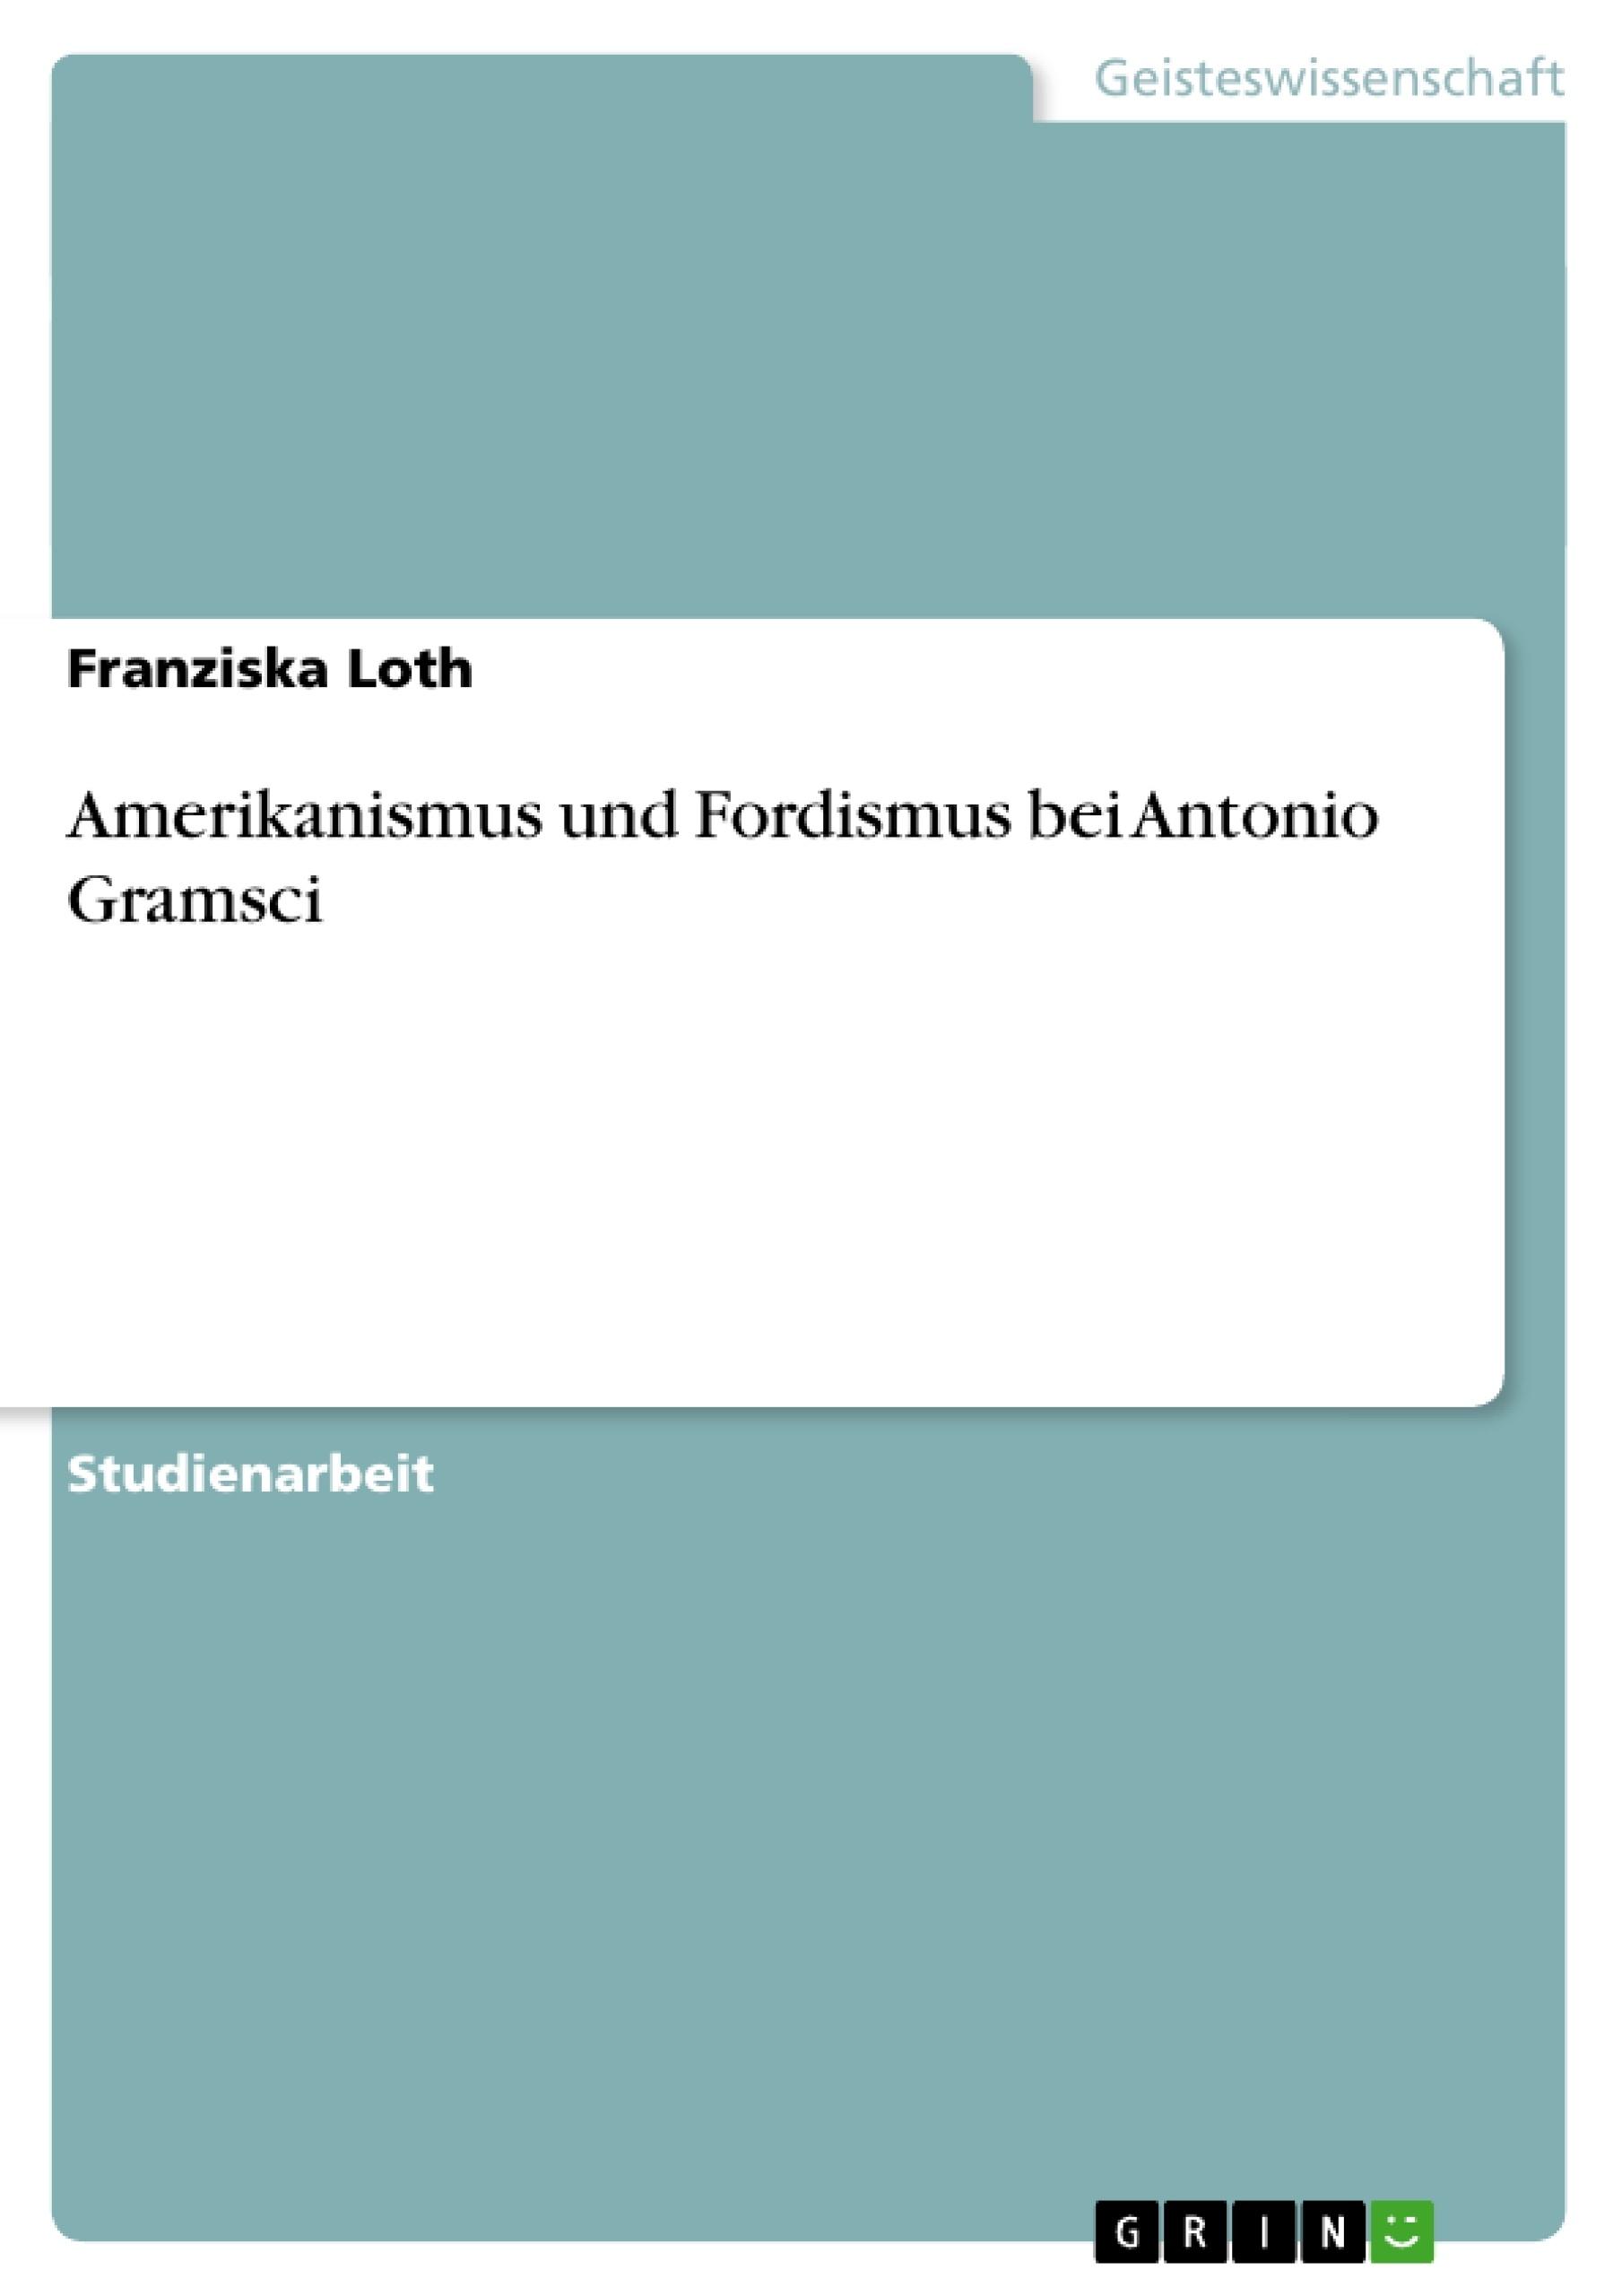 Titel: Amerikanismus und Fordismus bei Antonio Gramsci